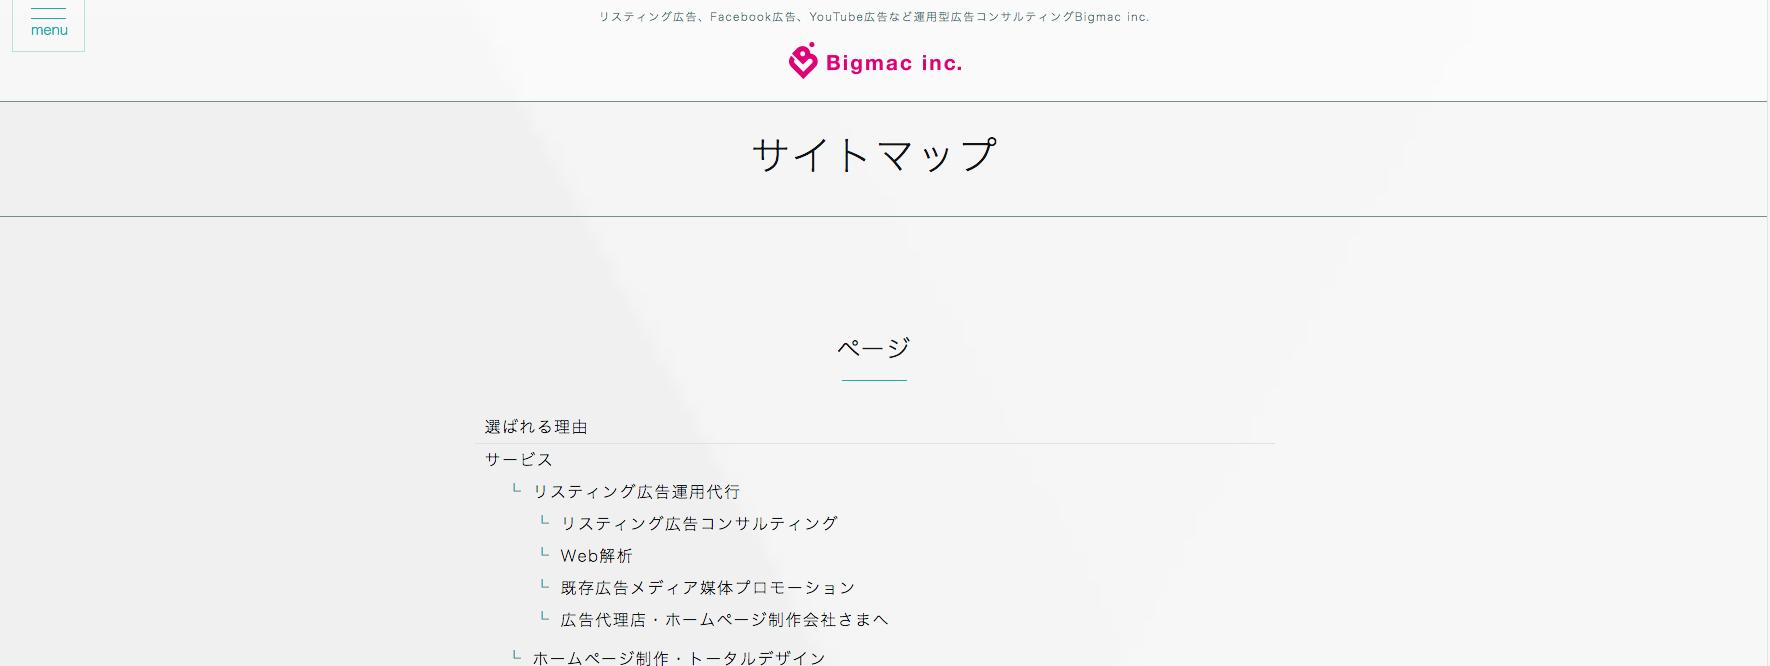 bigmac_sitemap